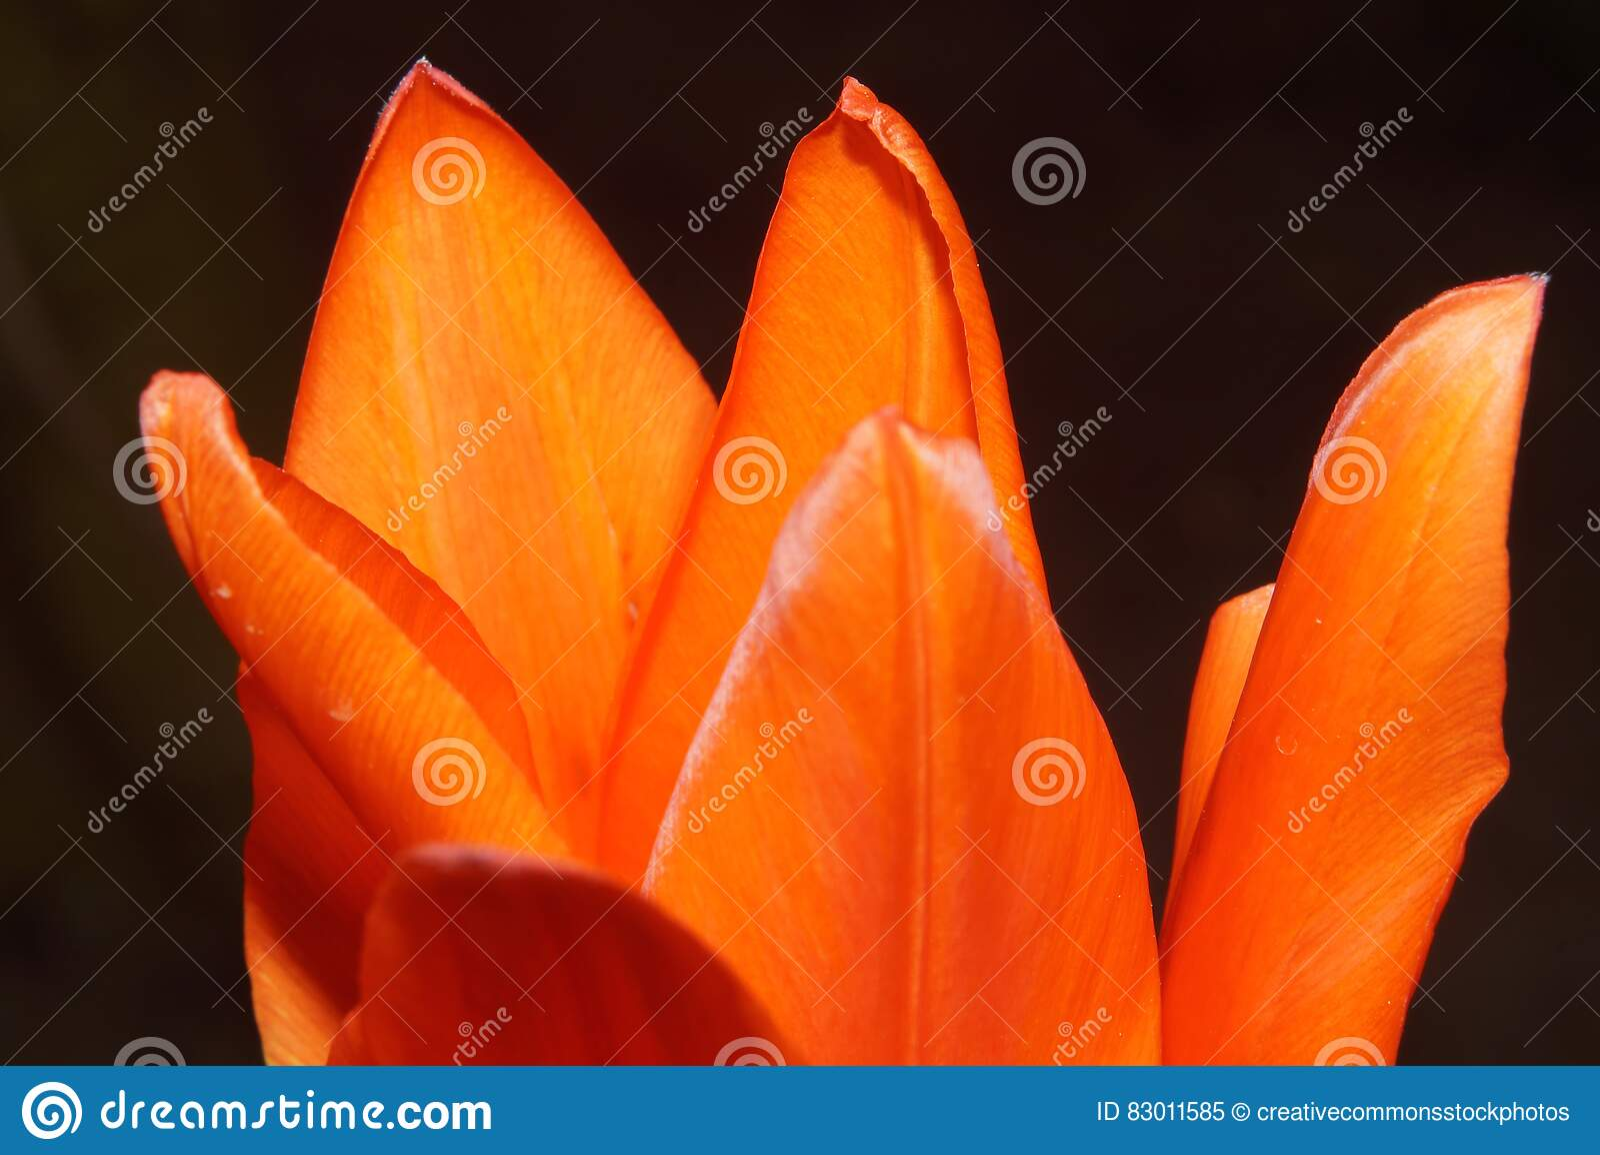 Download Orange Flower in Bloom stock image. Image of petals, flower - 83011585